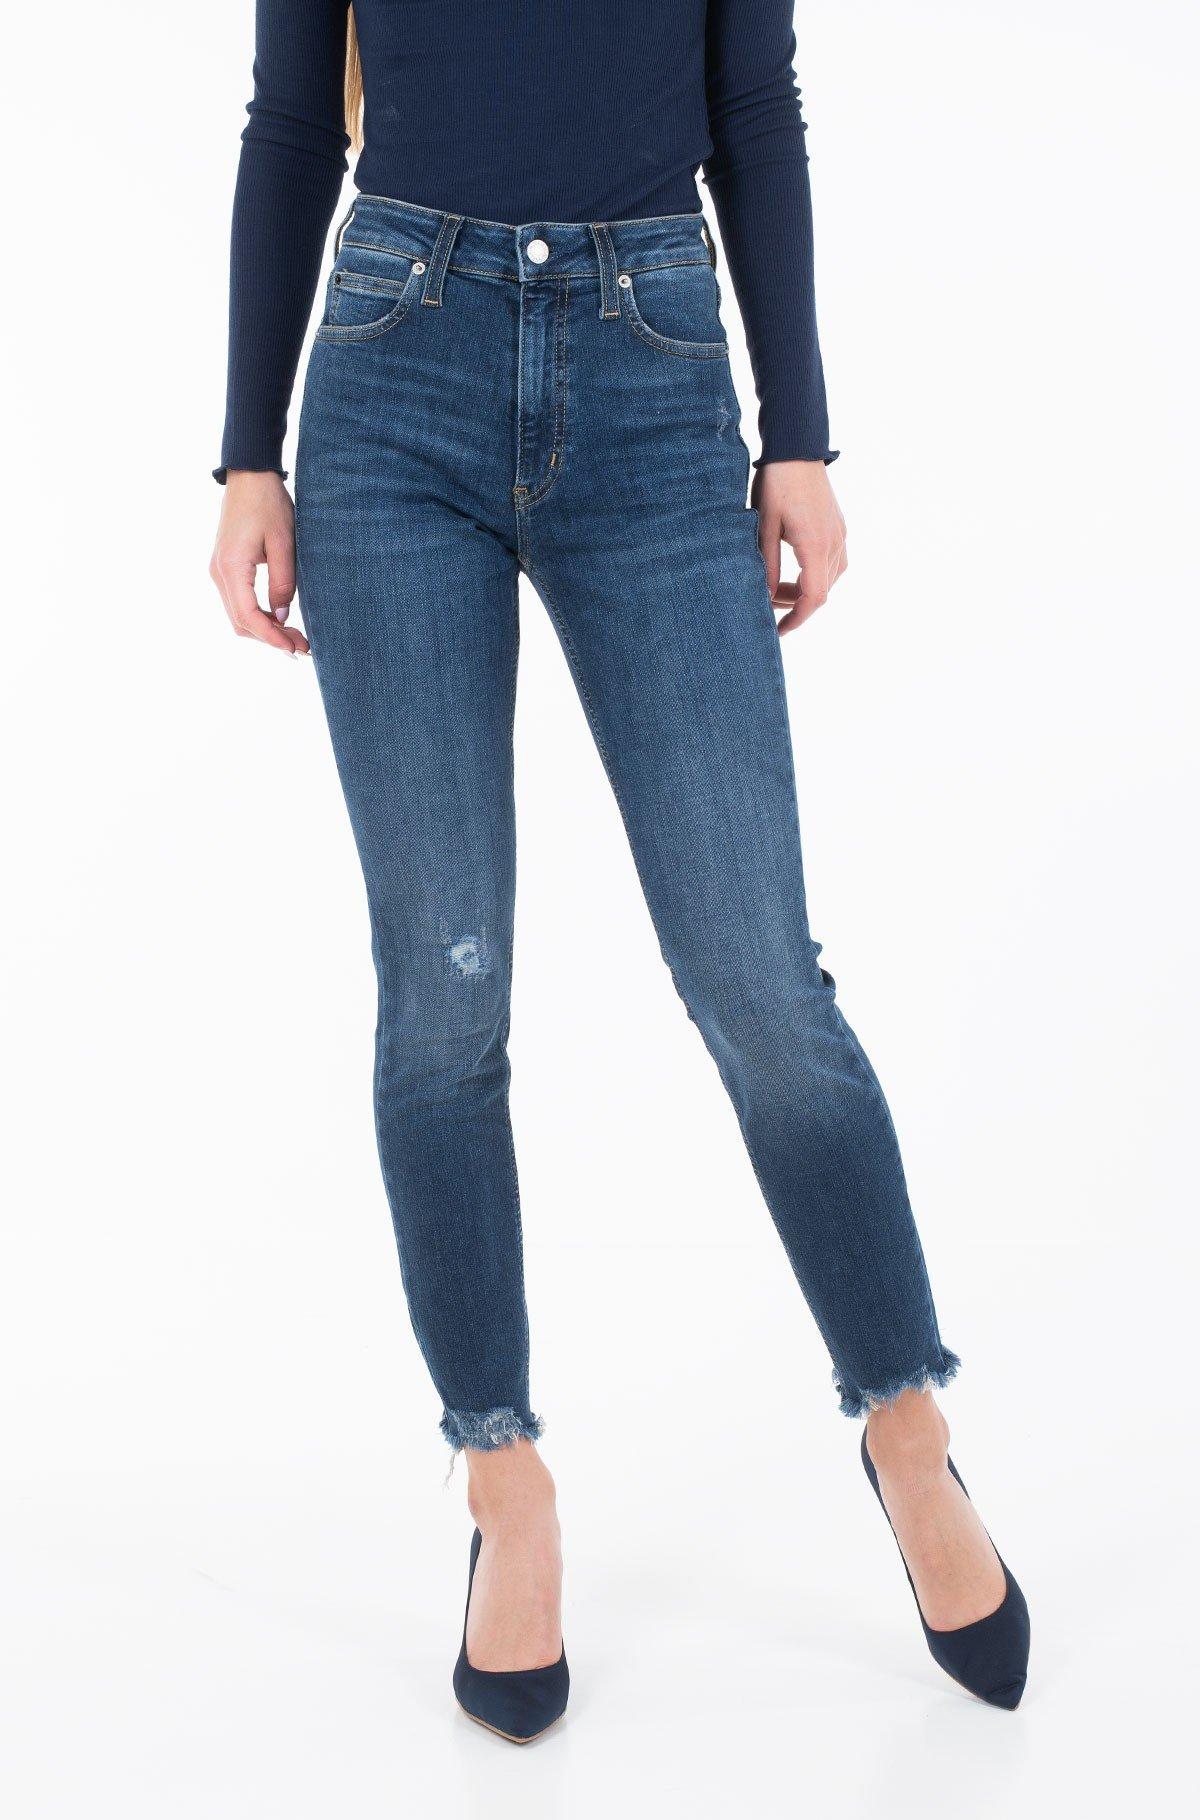 Jeans CKJ 010 HIGH RISE SKINNY ANKLE J20J211895-full-1